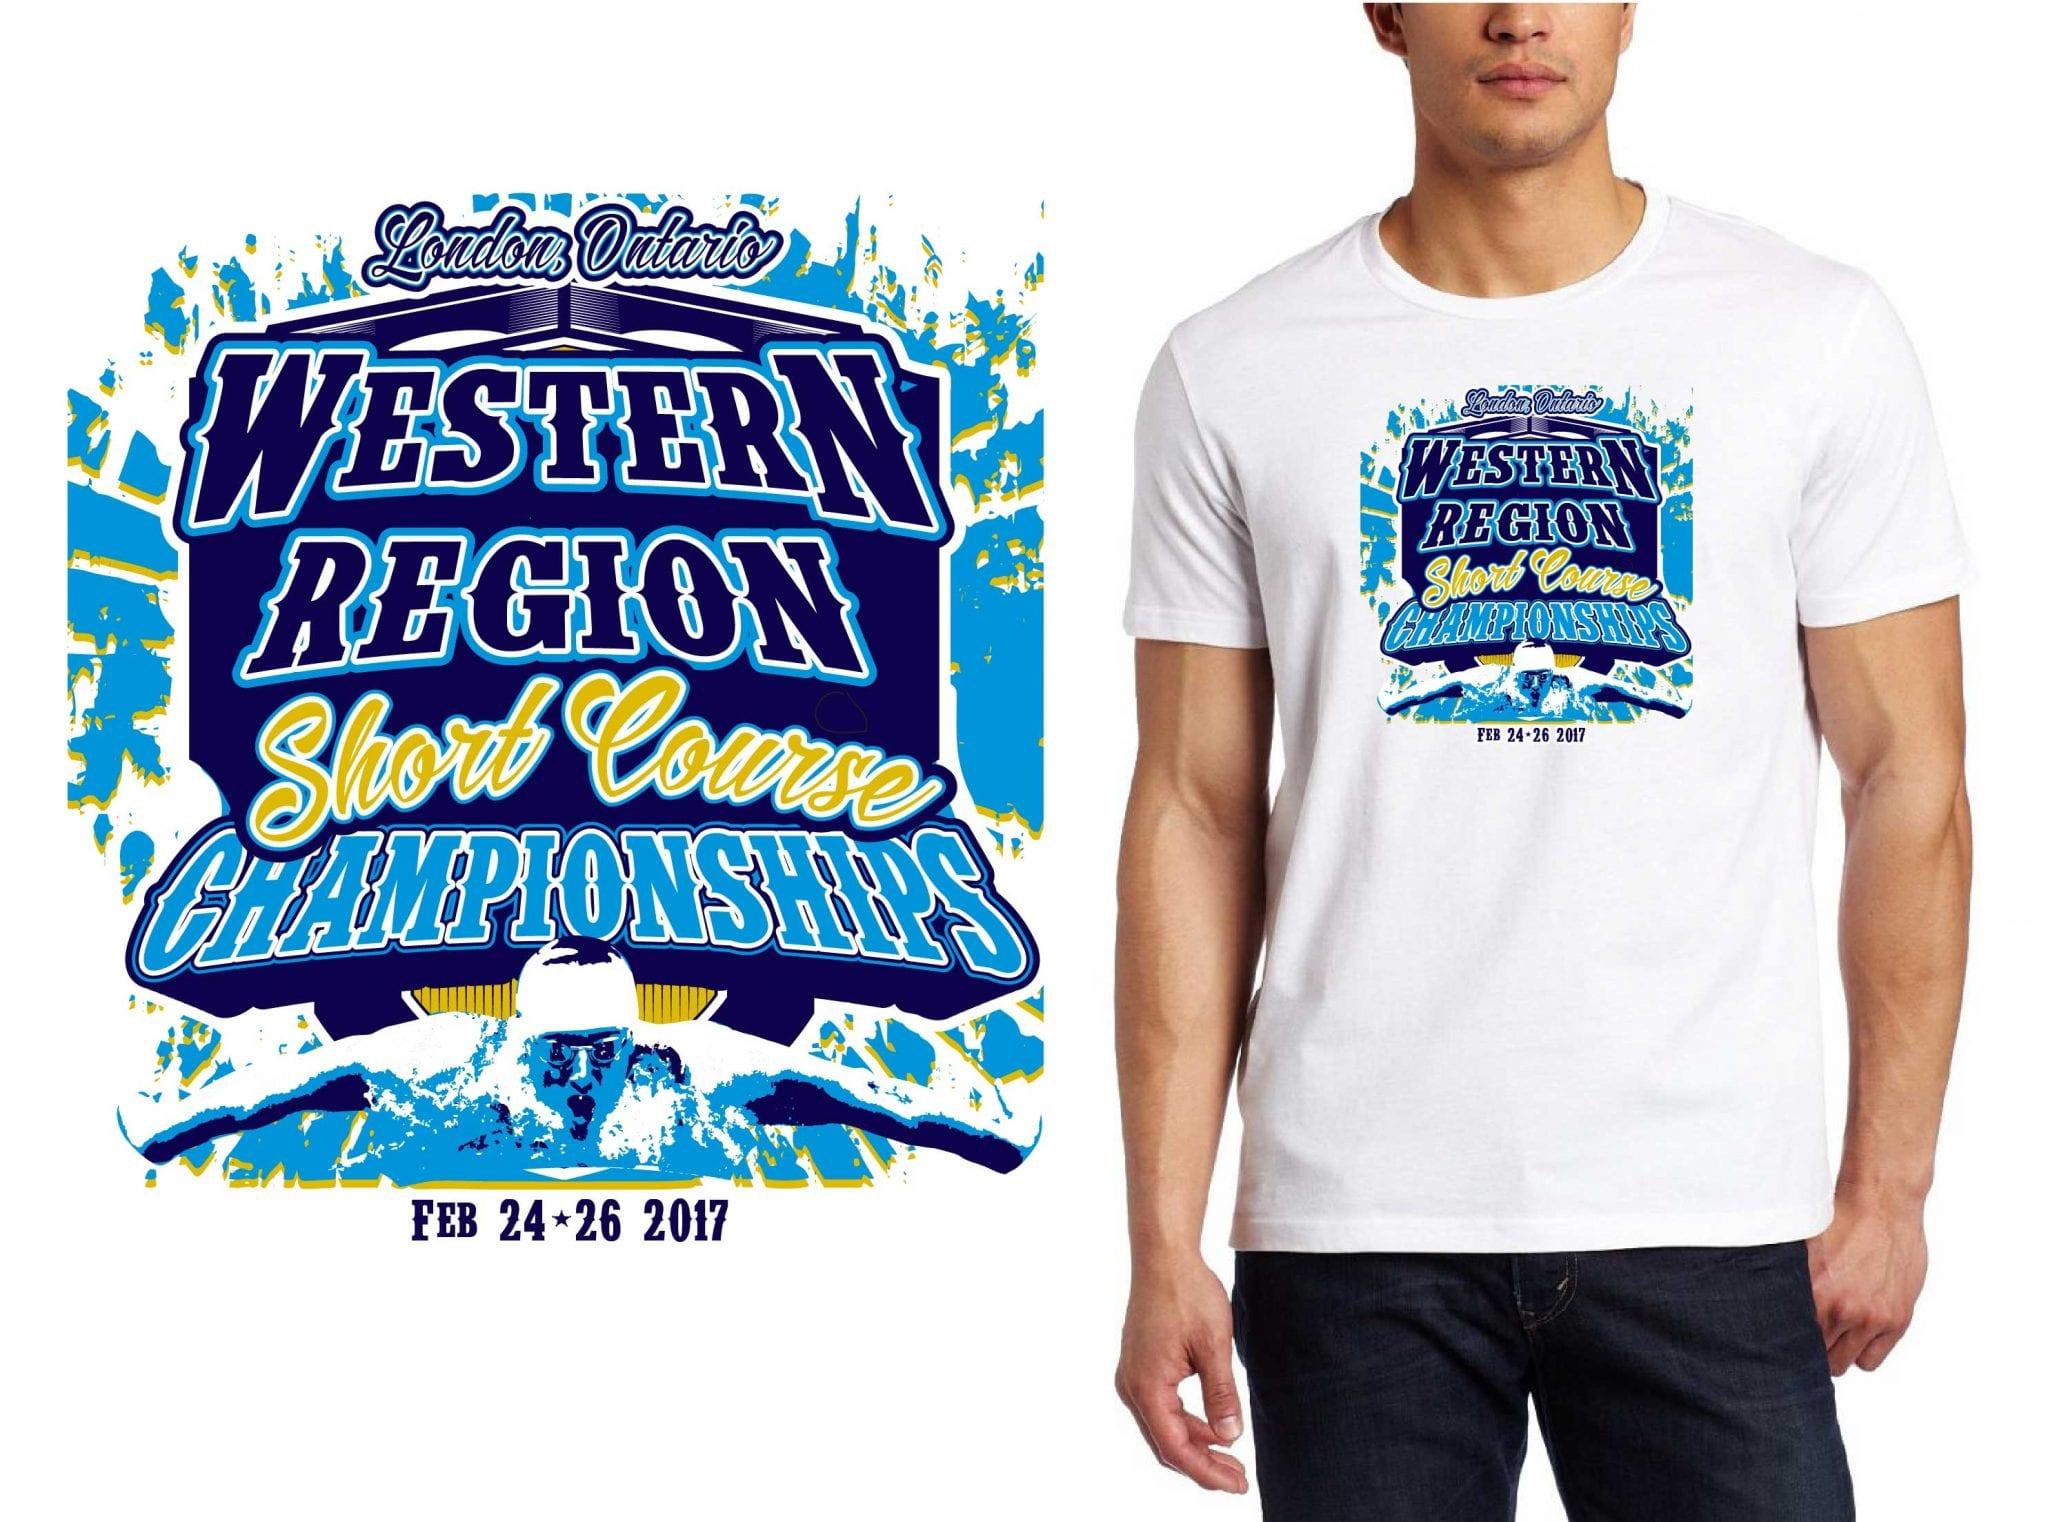 SWIMMING LOGO for western-Region-Swim-Competition-Championships T-SHIRT UrArtStudio